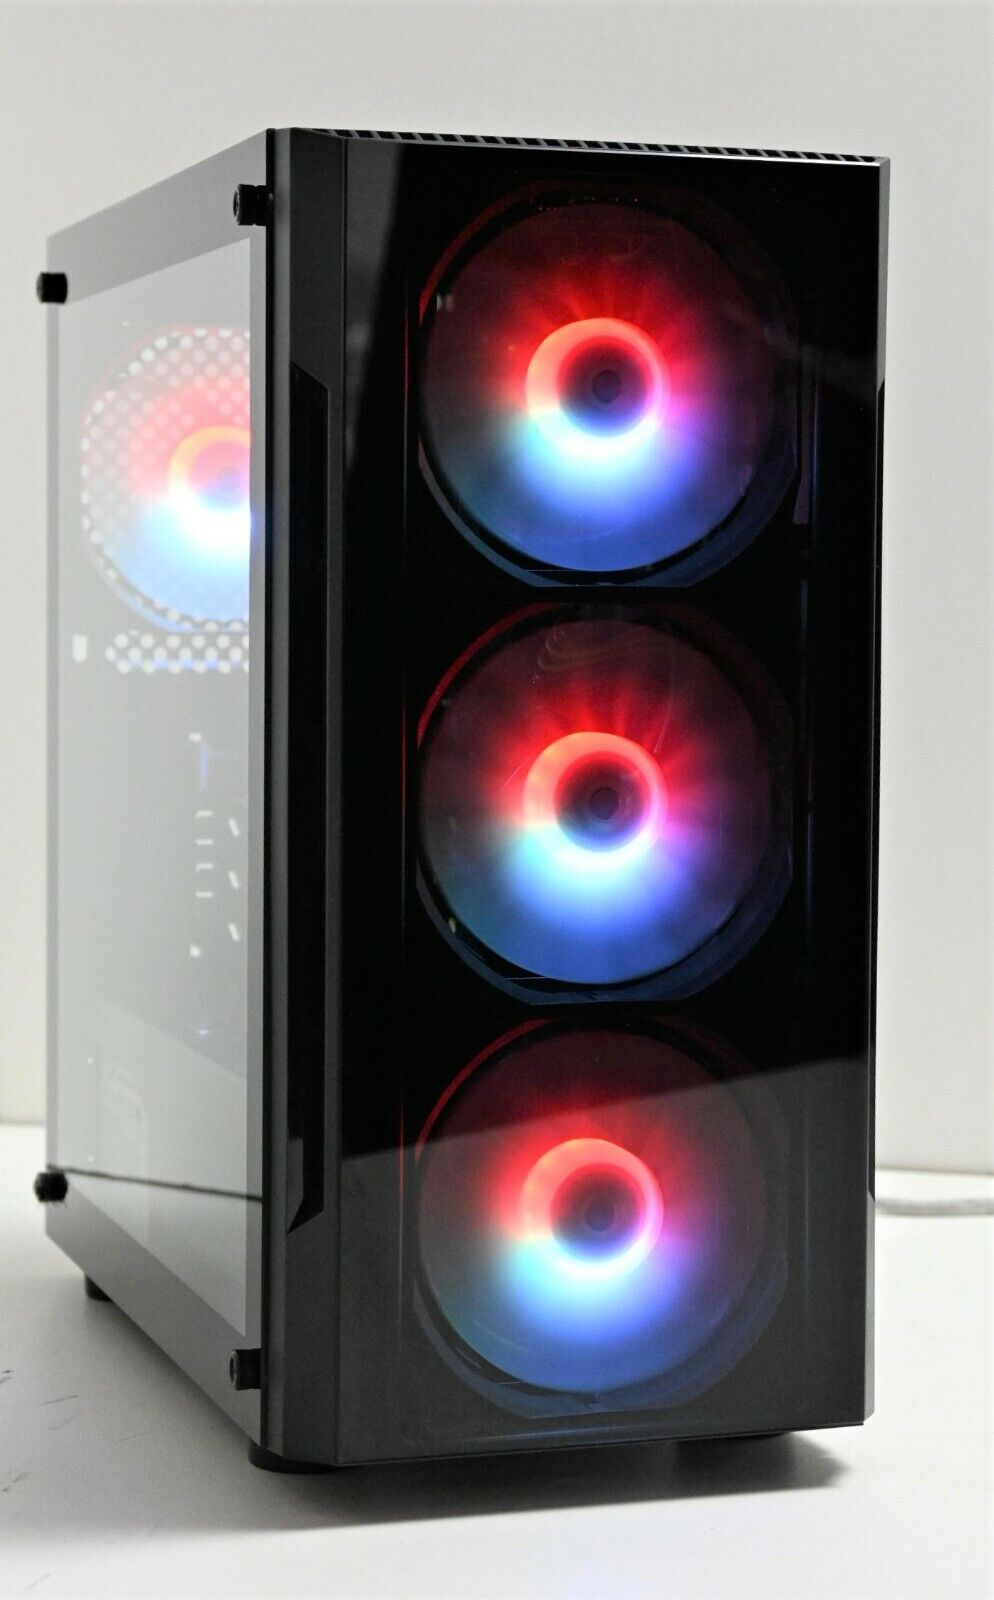 Computer Games - GAMING PC Computer Intel i5 480GB SSD 8GB RAM 4GB GDDR6 GTX 1650 WINDOWS 10 WIFI